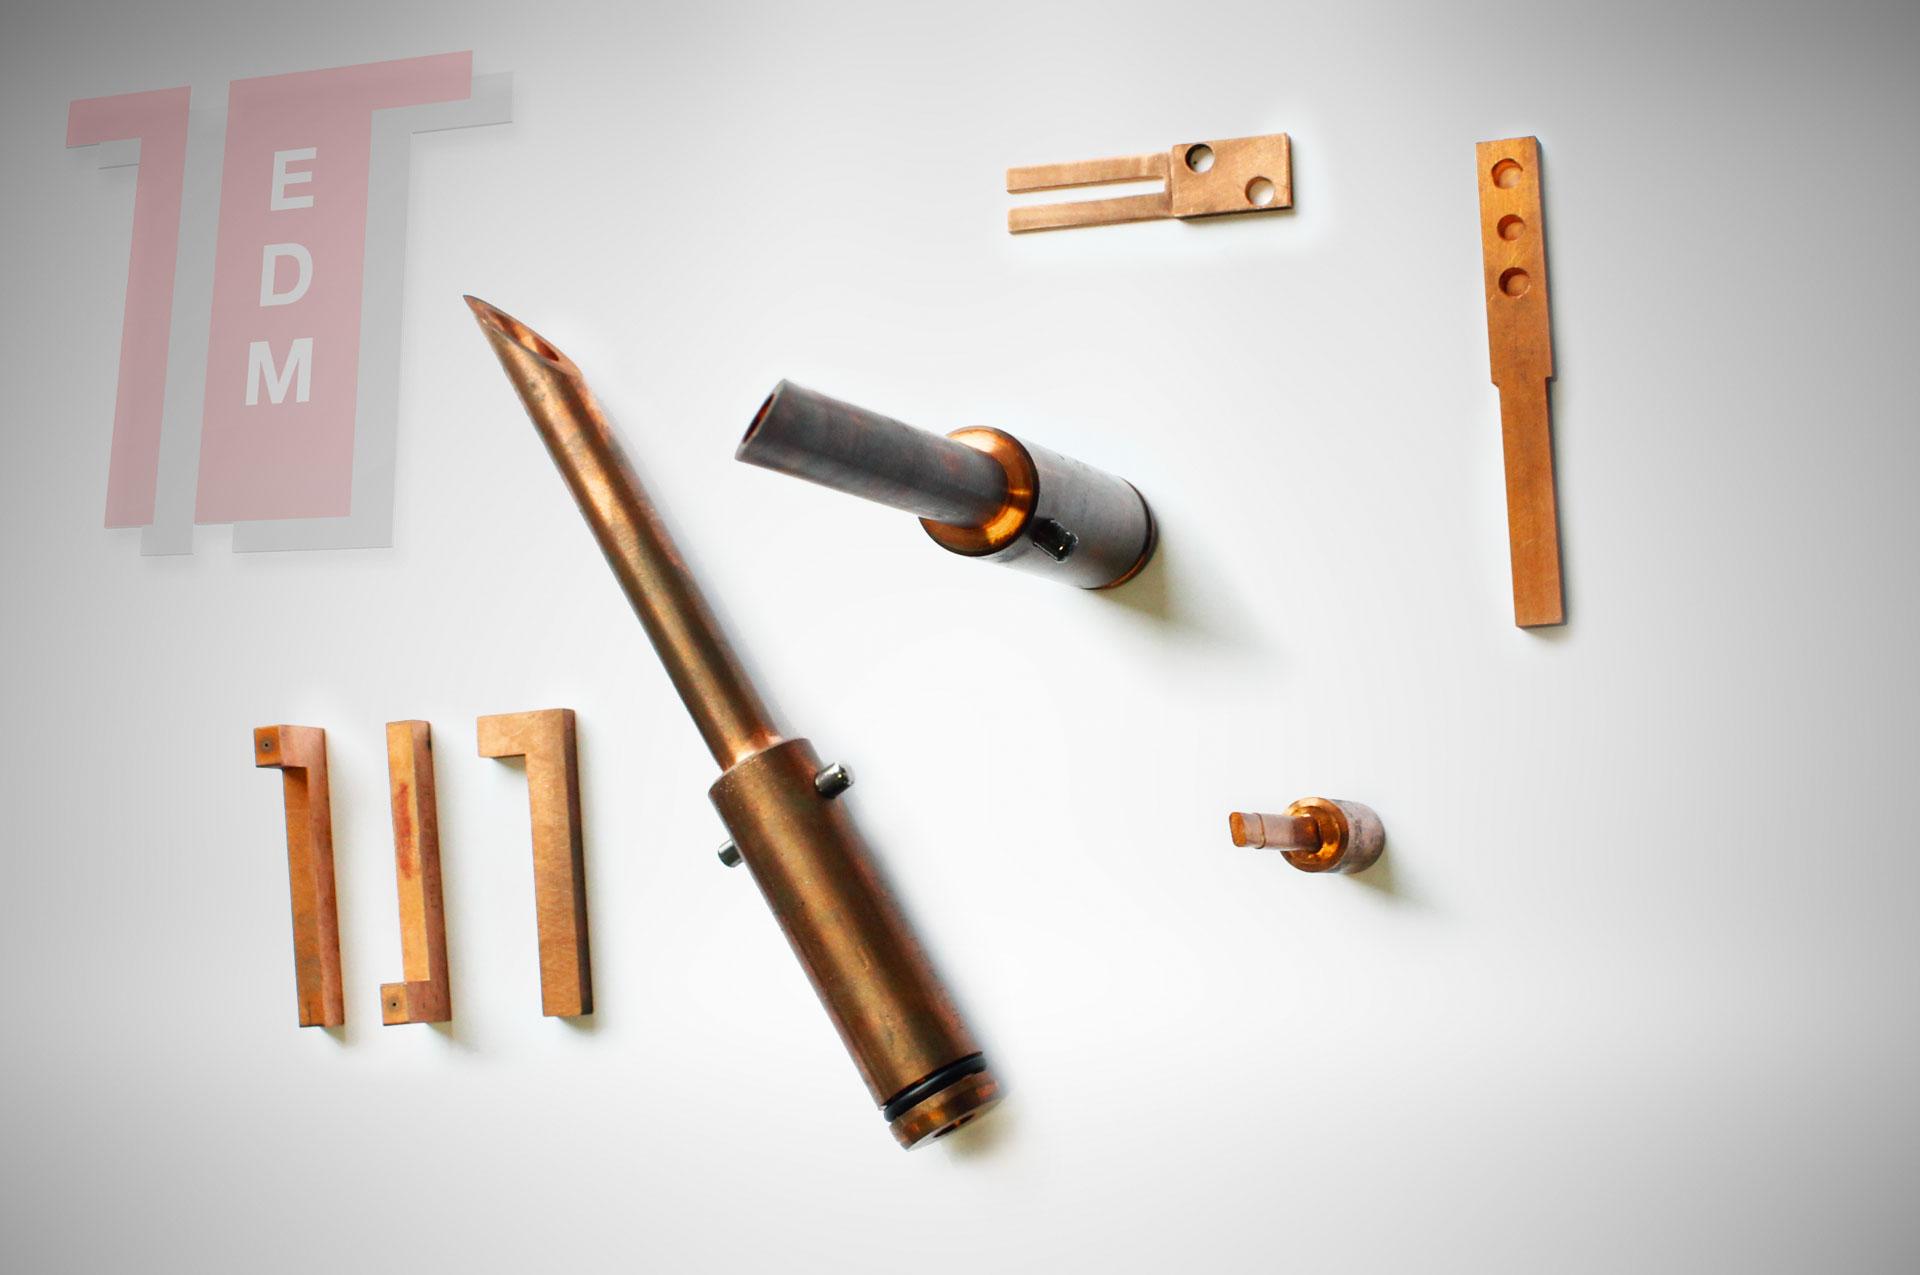 elettrodi rame produzione standard elettrodi in rame Copper electrodes